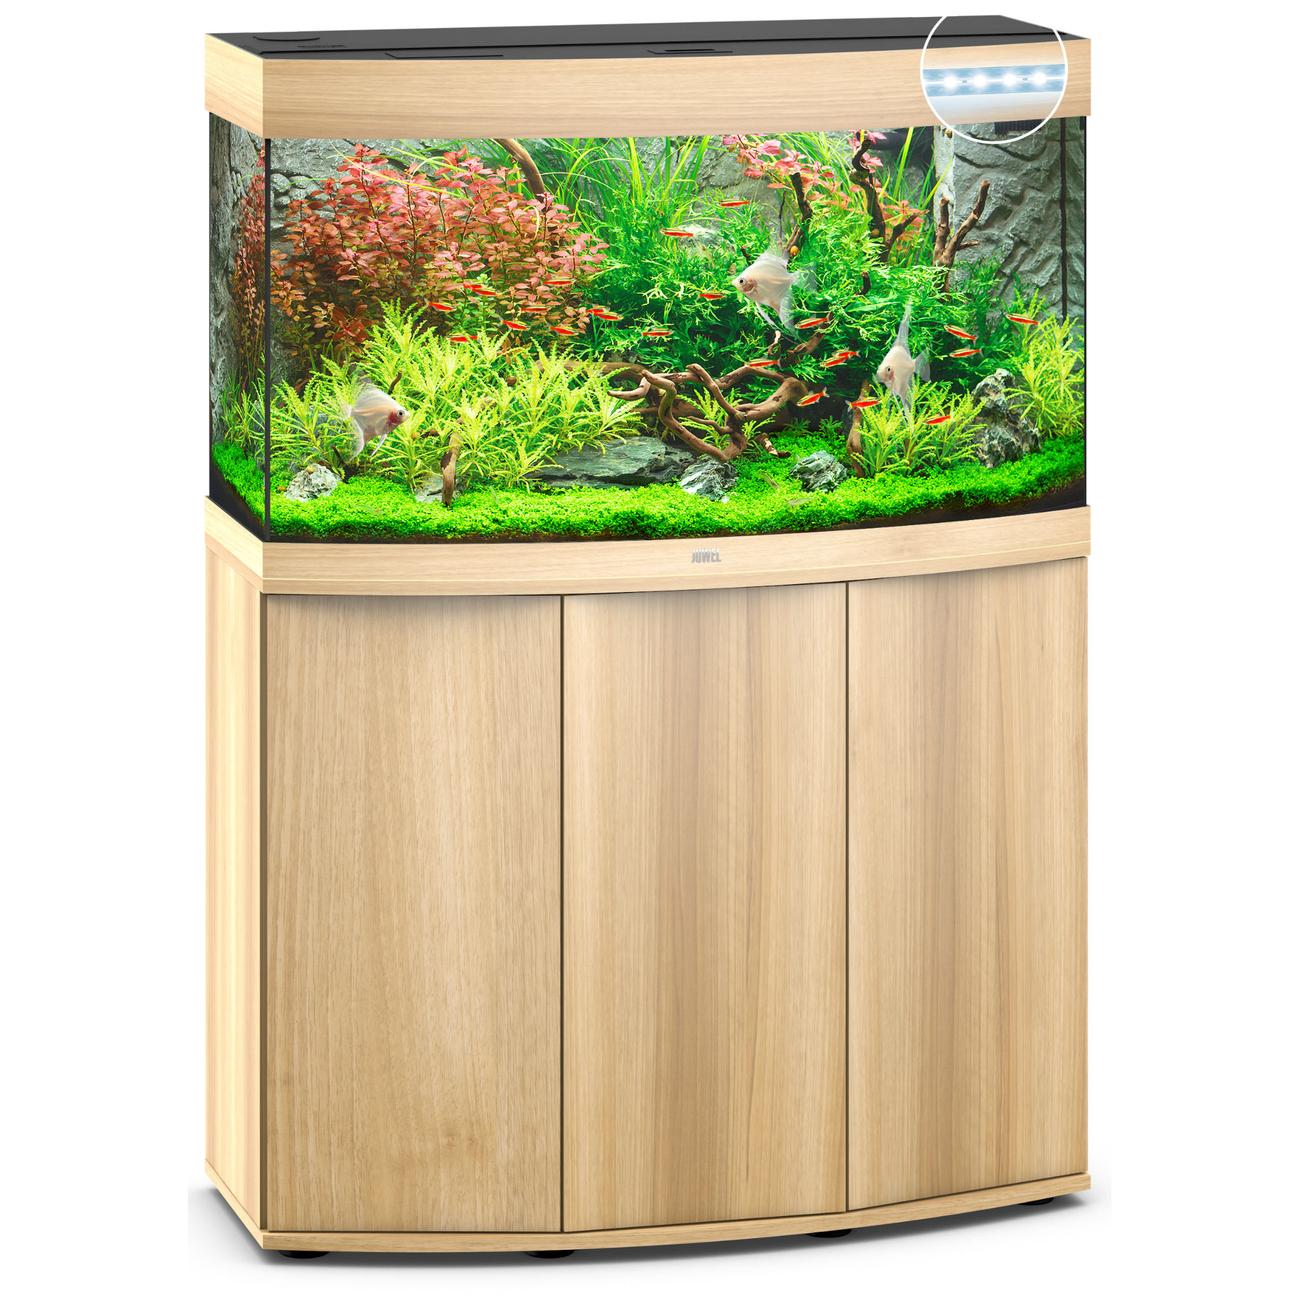 Juwel Vision 180 LED Aquarium mit Unterschrank, Bild 12